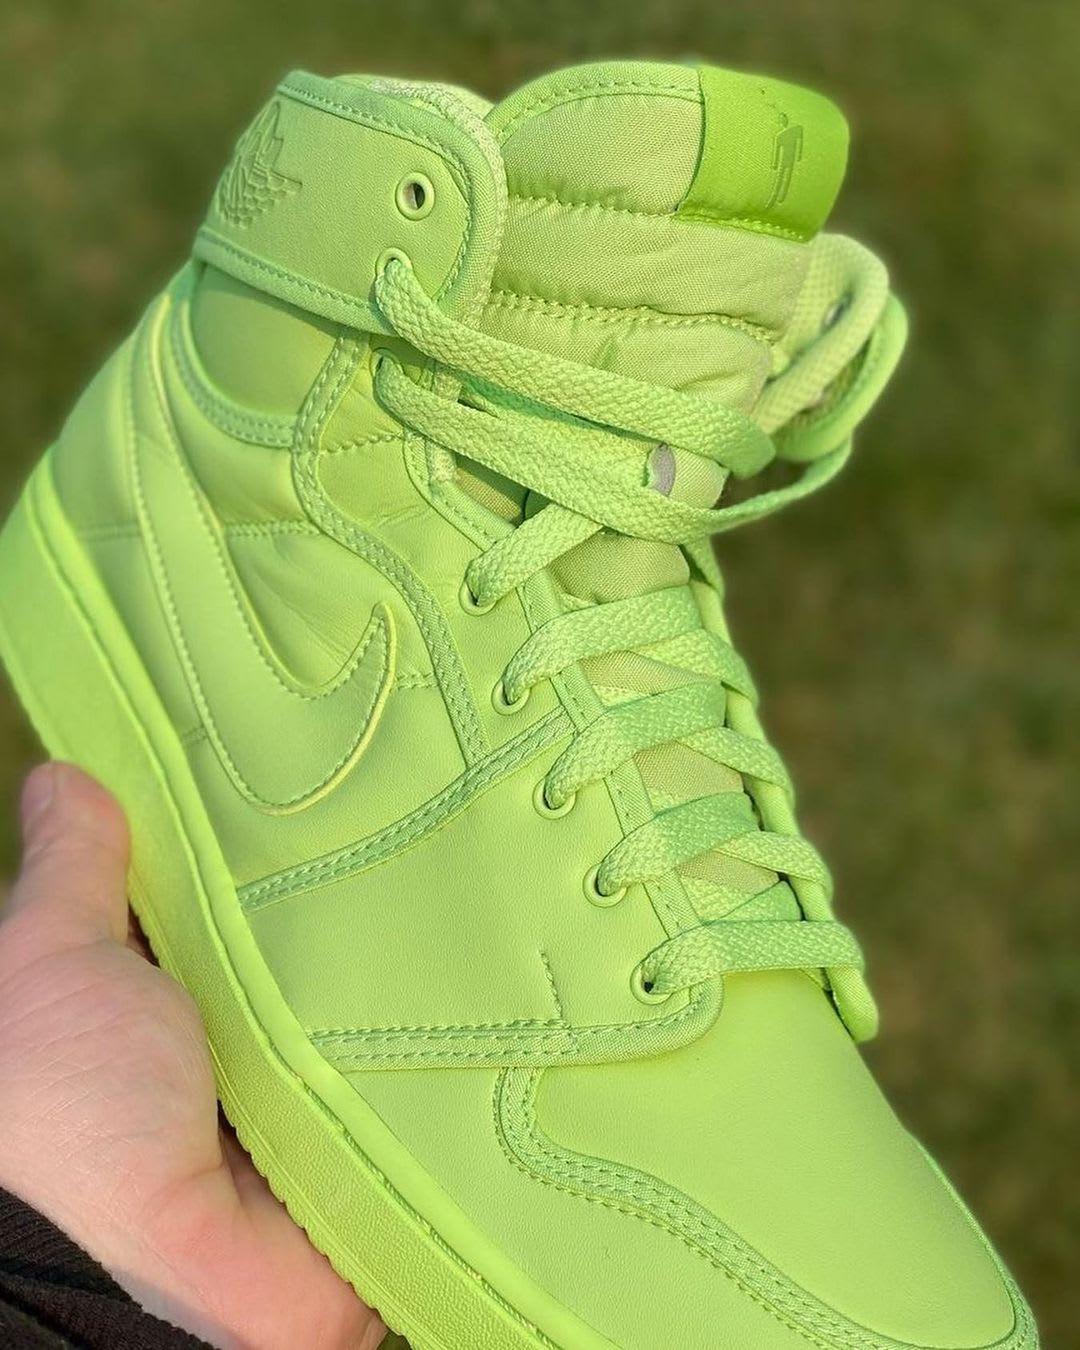 Billie Eilish x Air Jordan 1 KO 'Ghost Green' DN2857-330 (Unlaced)